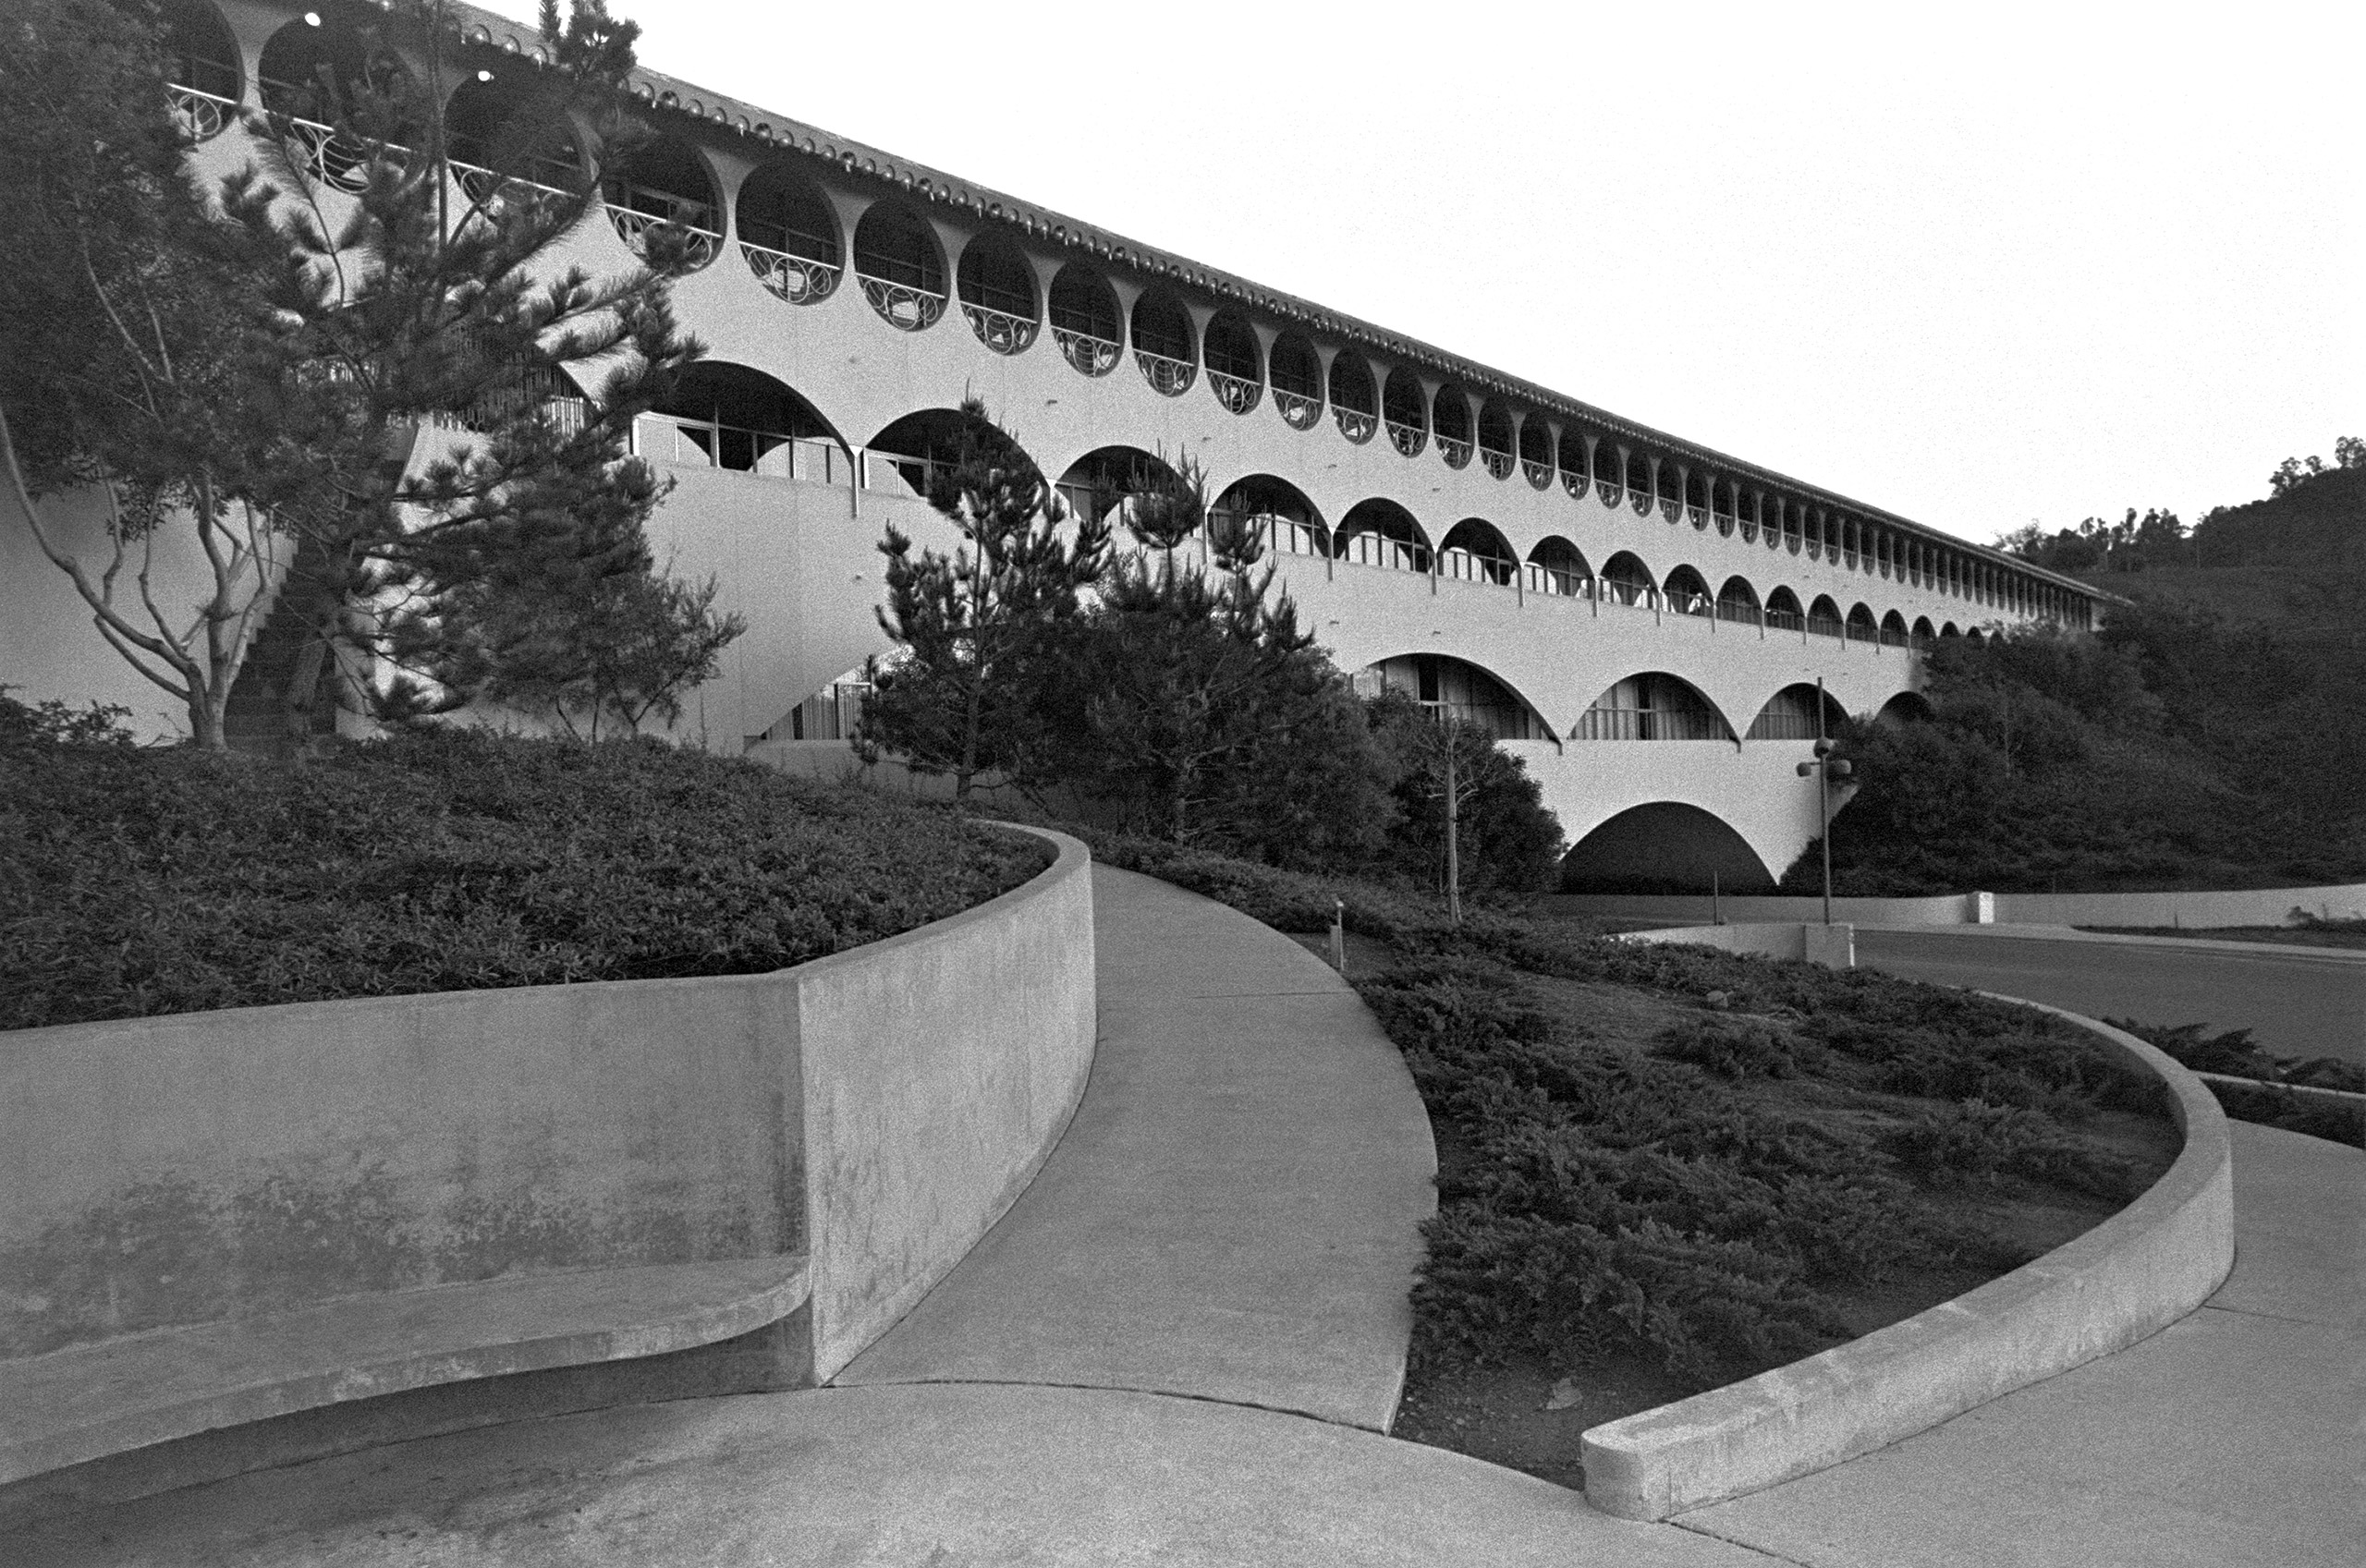 Frank Lloyd Wright's Marin County Civic Cente rin San Rafael, Calif. Built circa 1960.